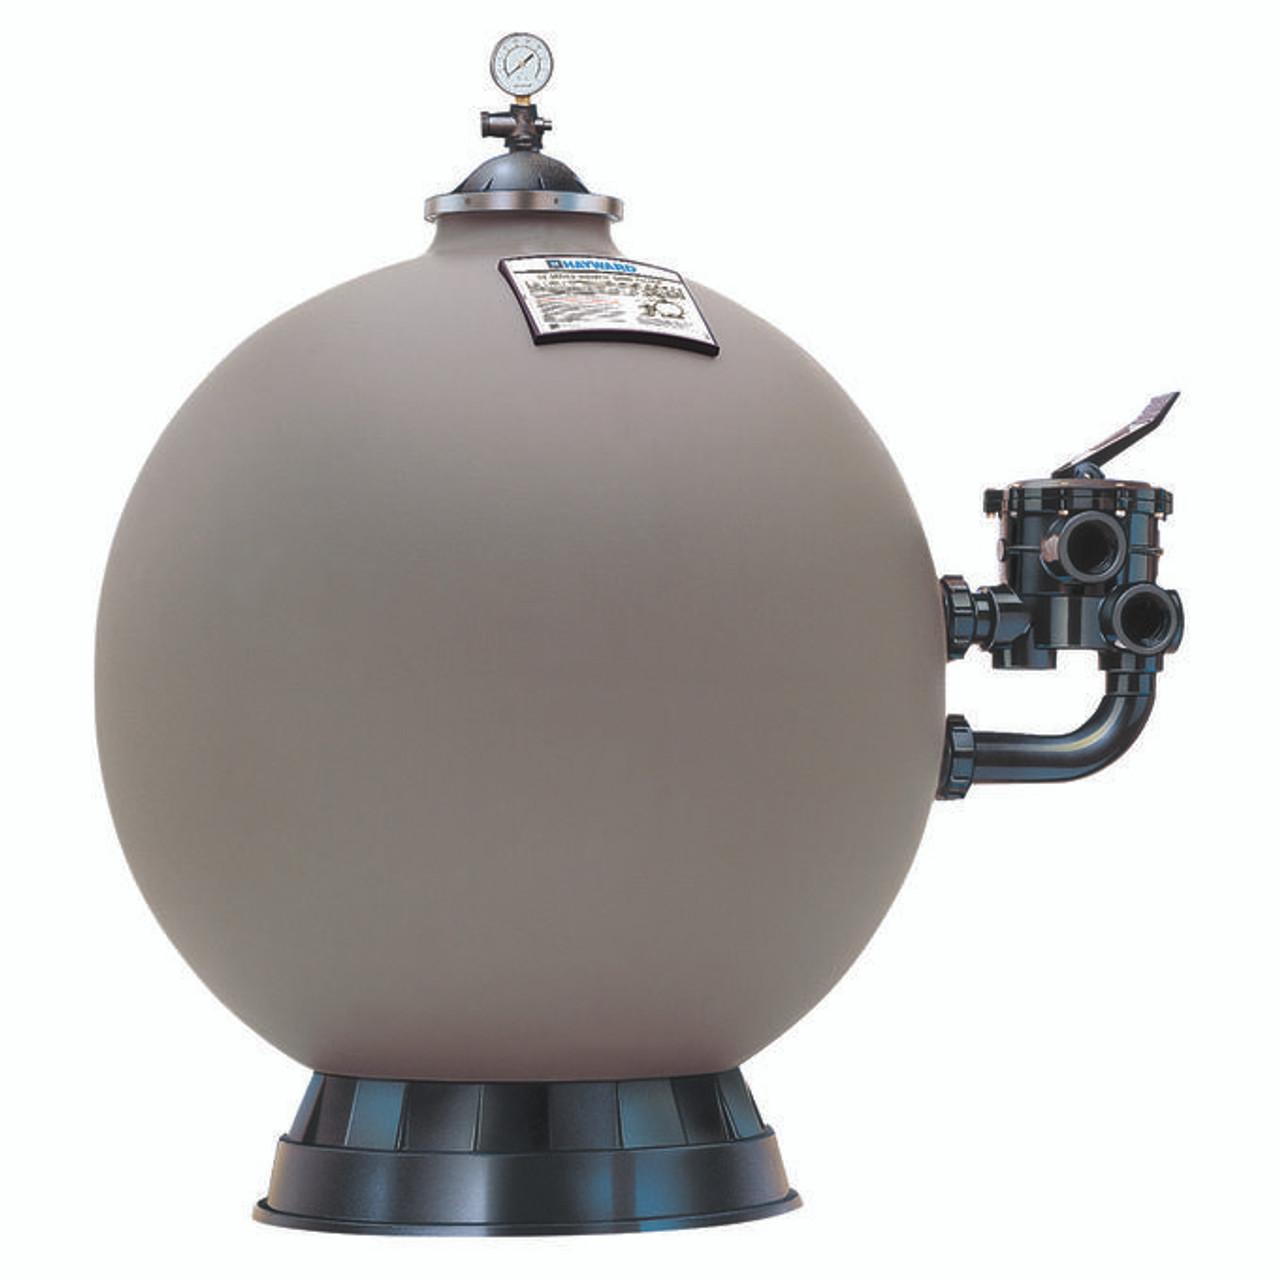 "Hayward LS Series Aquatic Sand Filter 39"" High X 31"" Diamete (LS311SX)"